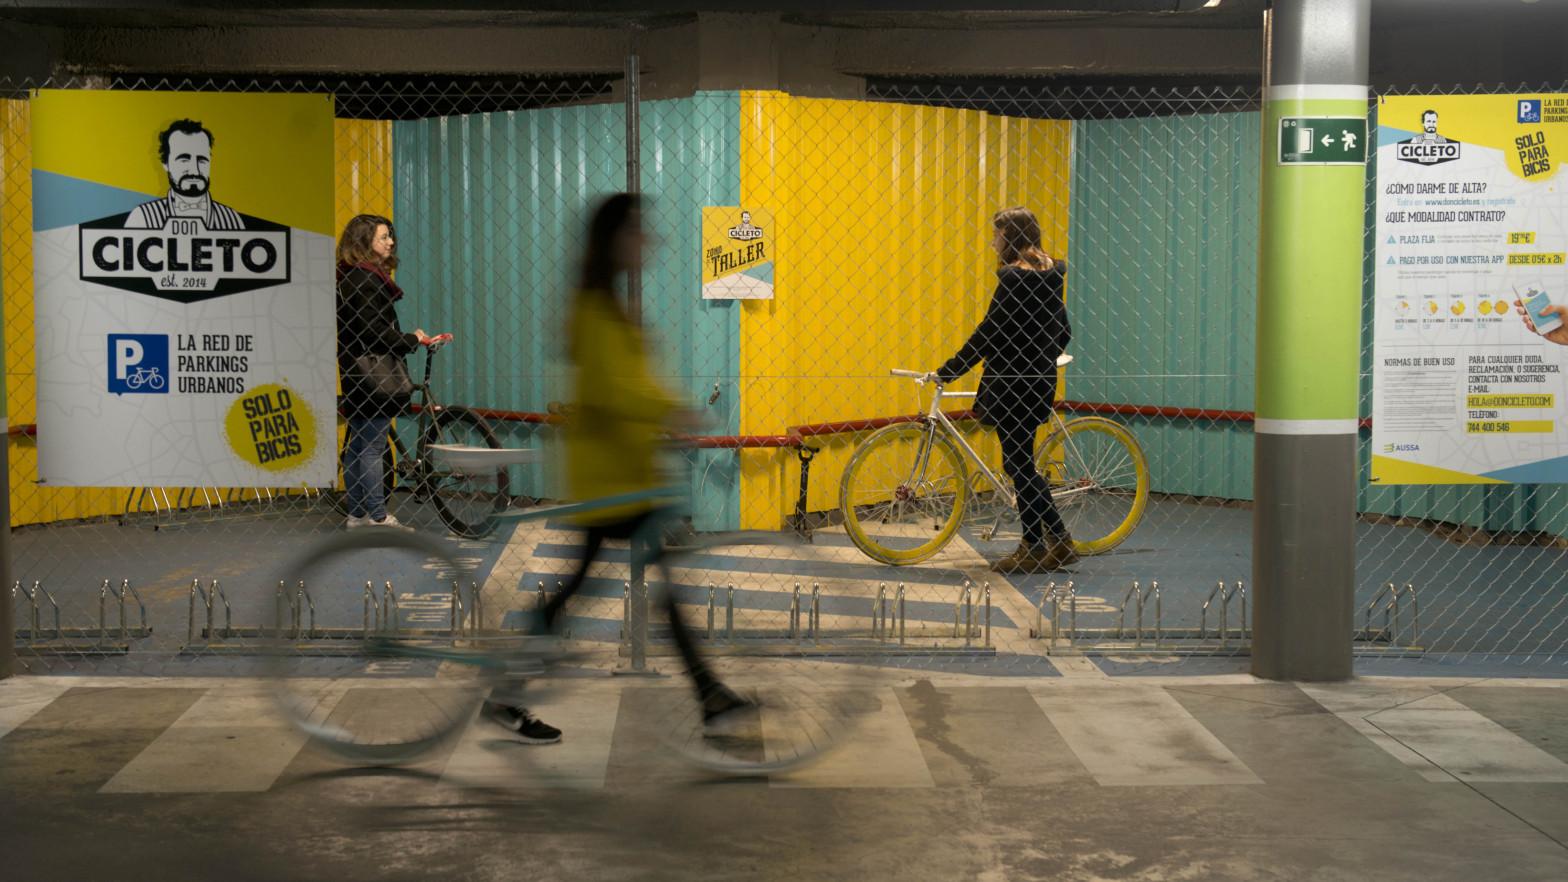 Cabify ofrece parking de bicicletas a través de Don Cicleto